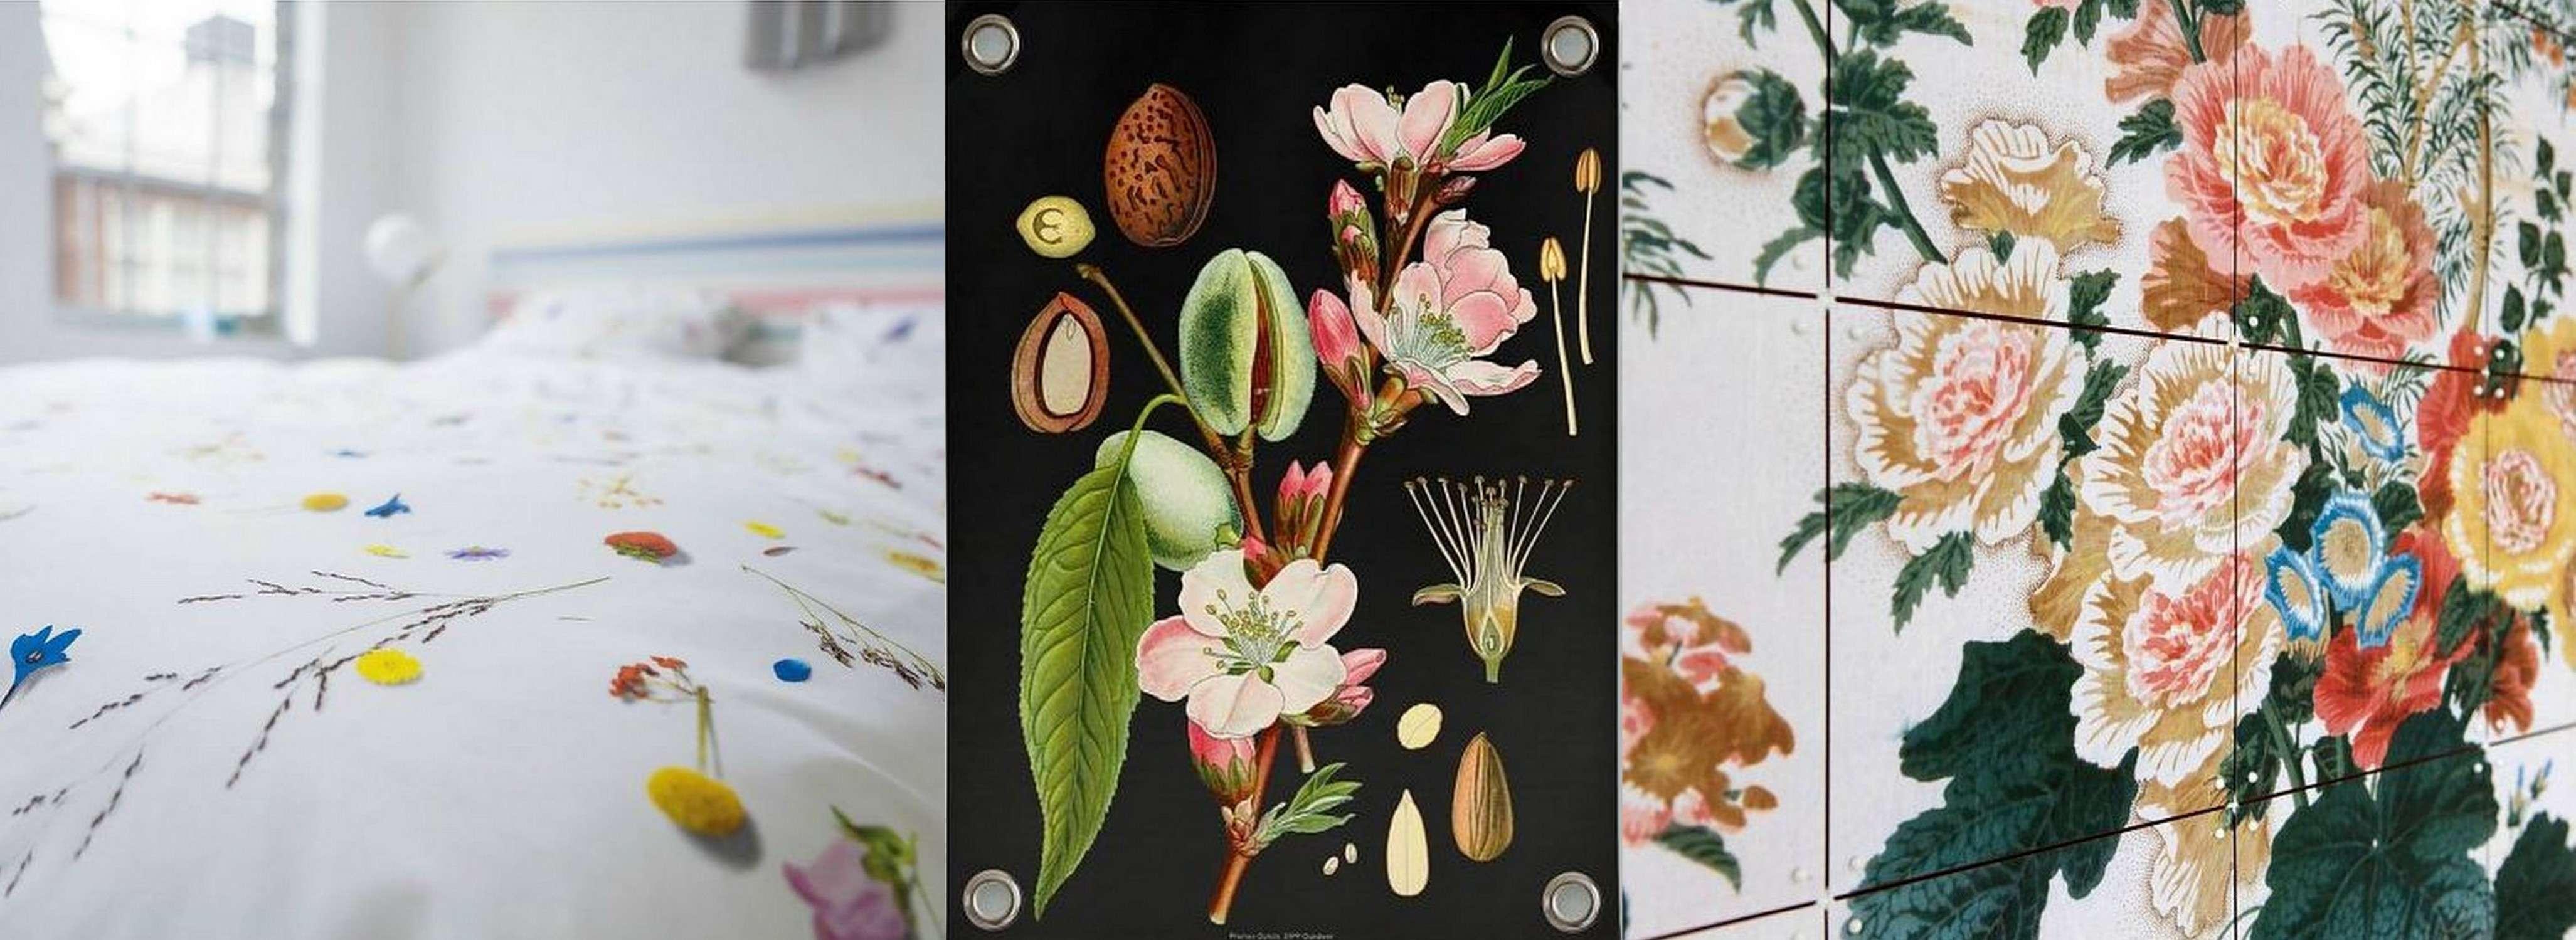 collage bloemenprints 2